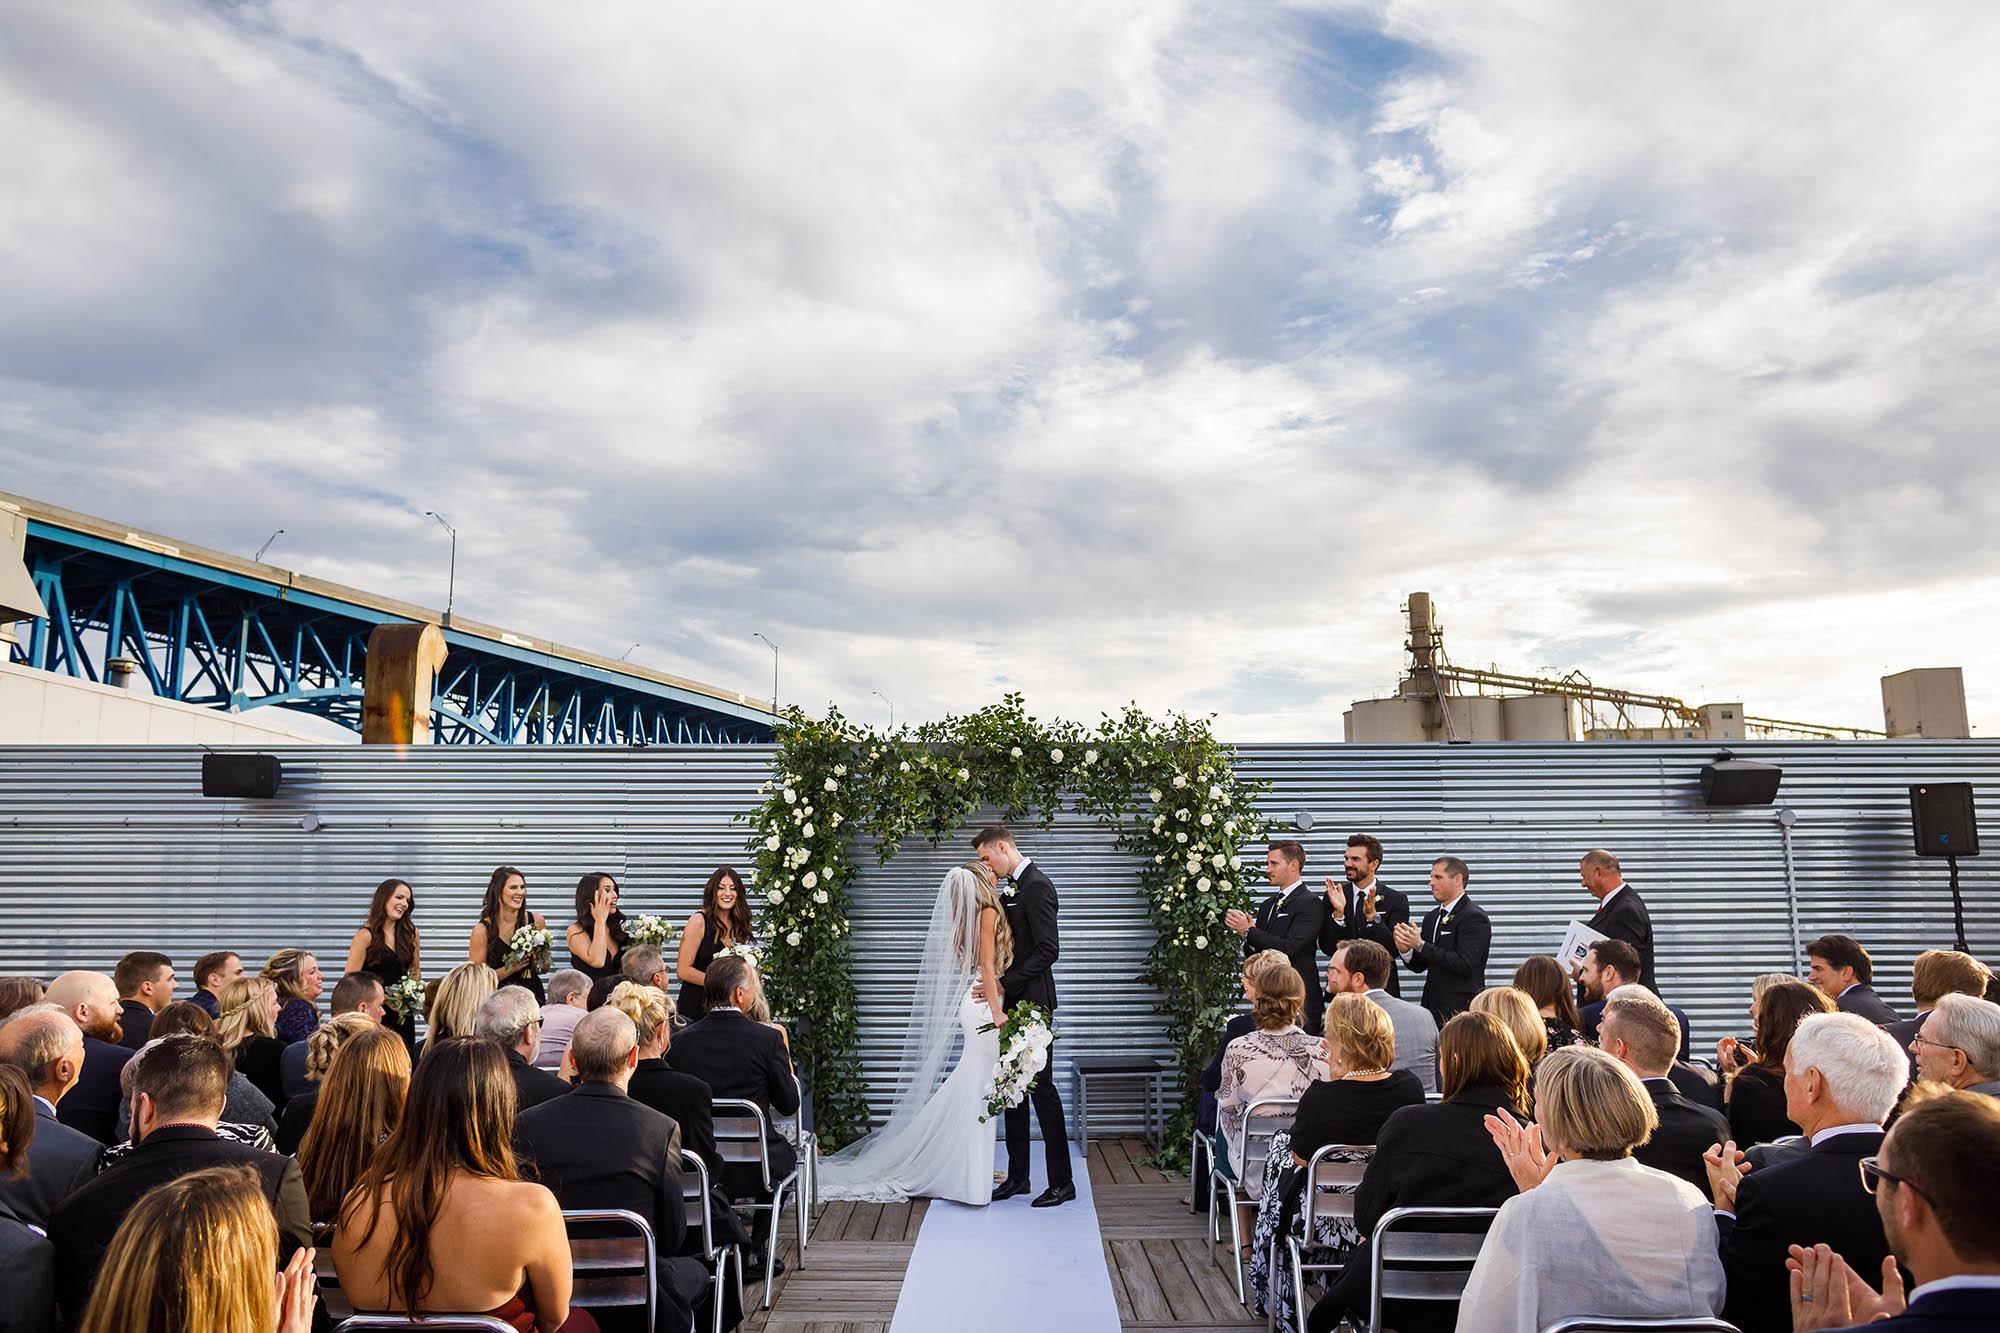 Wedding, Ceremony, music box, Music Box Supper Club